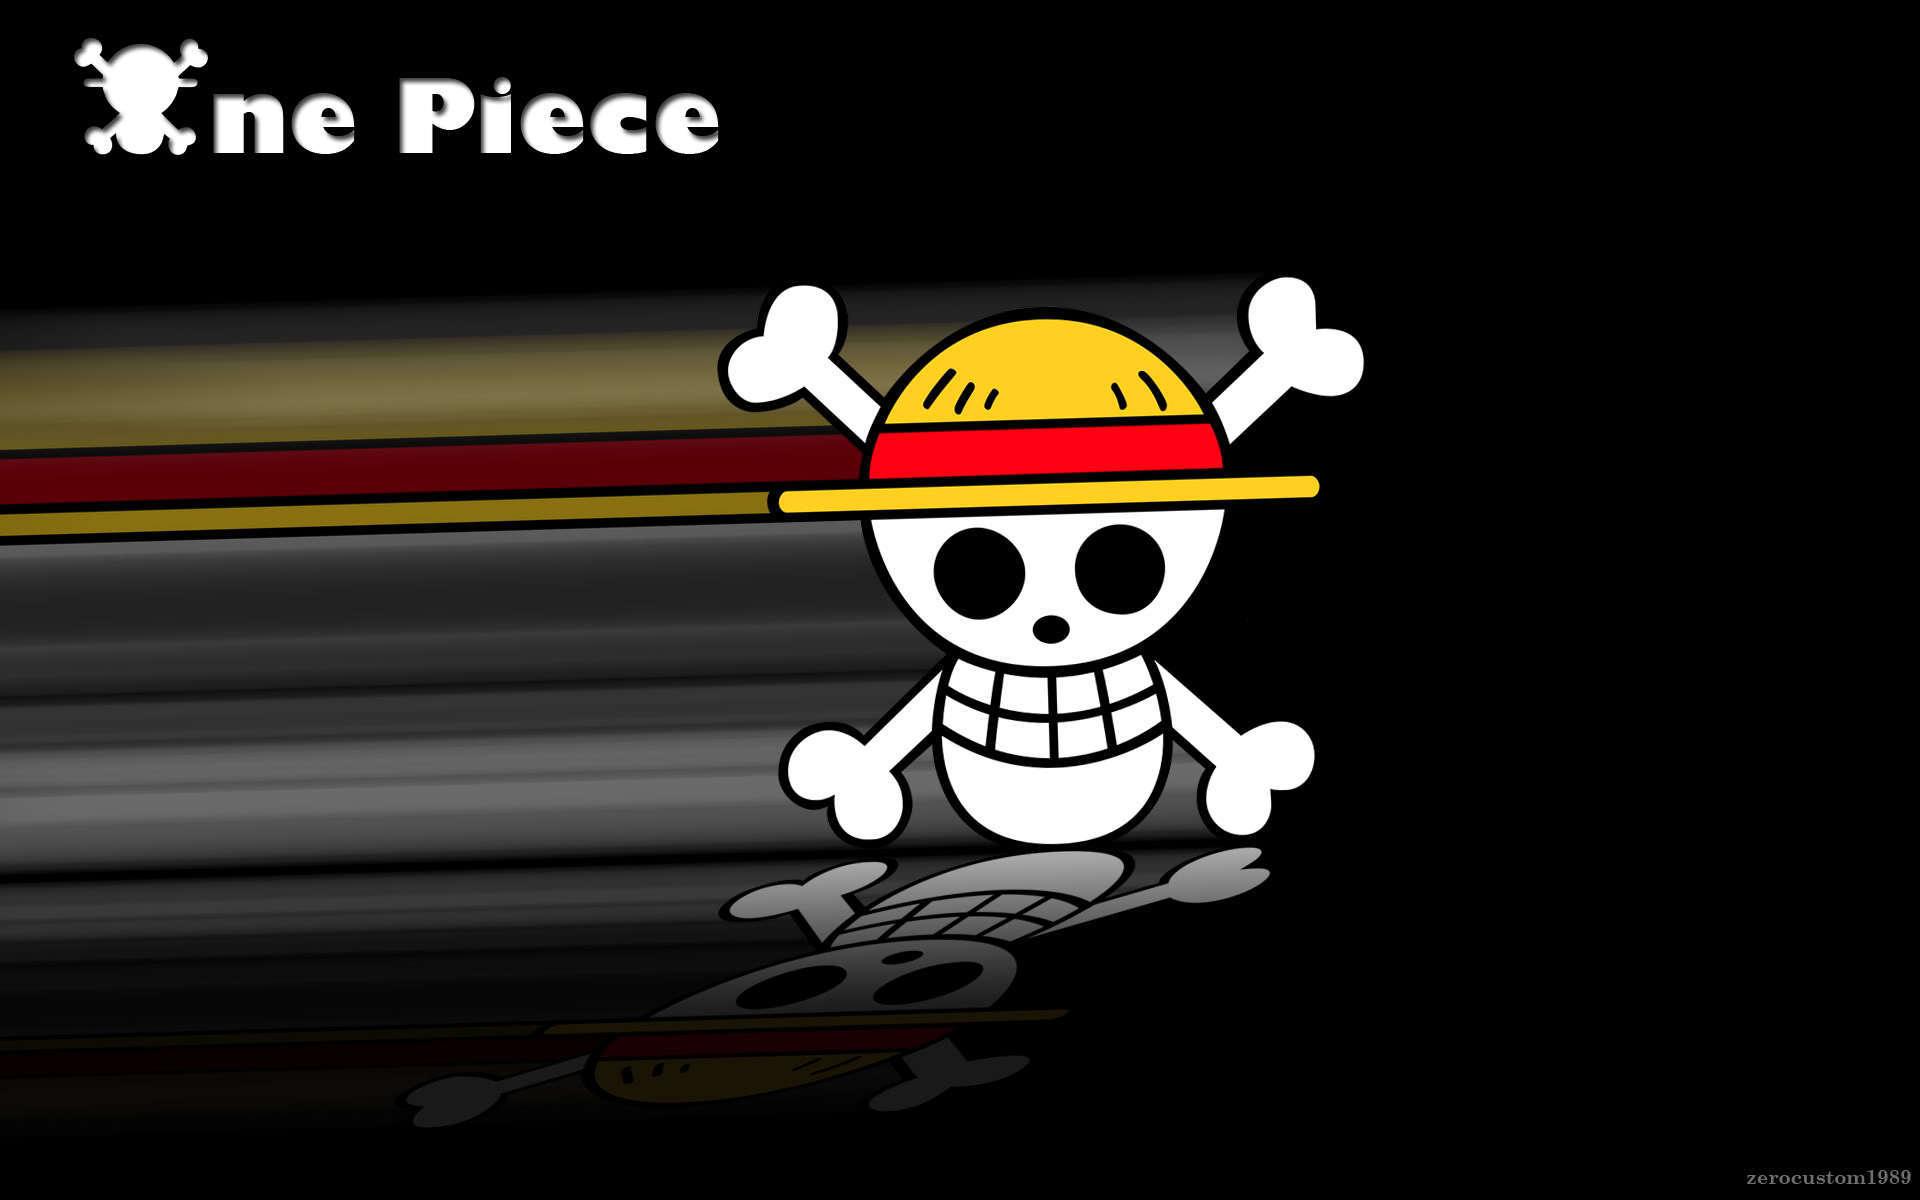 Foto Wallpaper Tengkorak One Piece Desktop Wallpaper Windows 7 Hd 1920x1200 Download Hd Wallpaper Wallpapertip